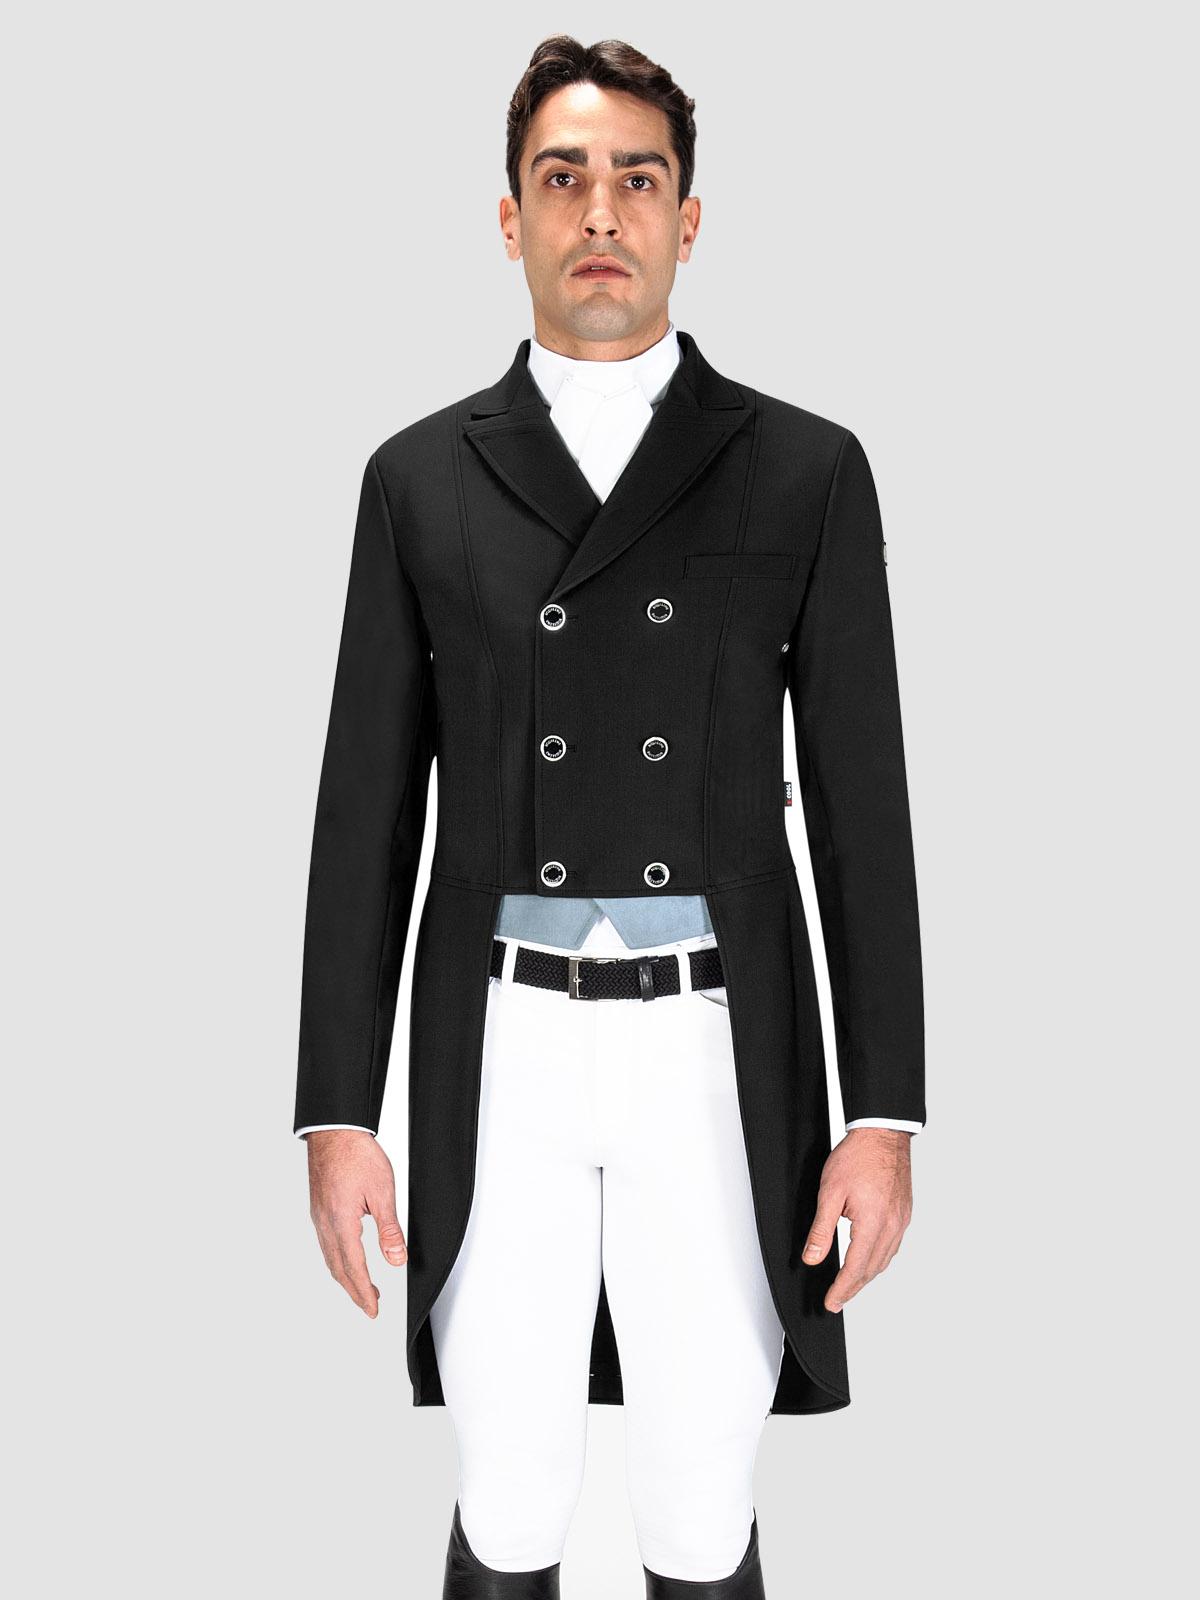 CANTER Men's Dressage Tailcoat X Cool Evo 2